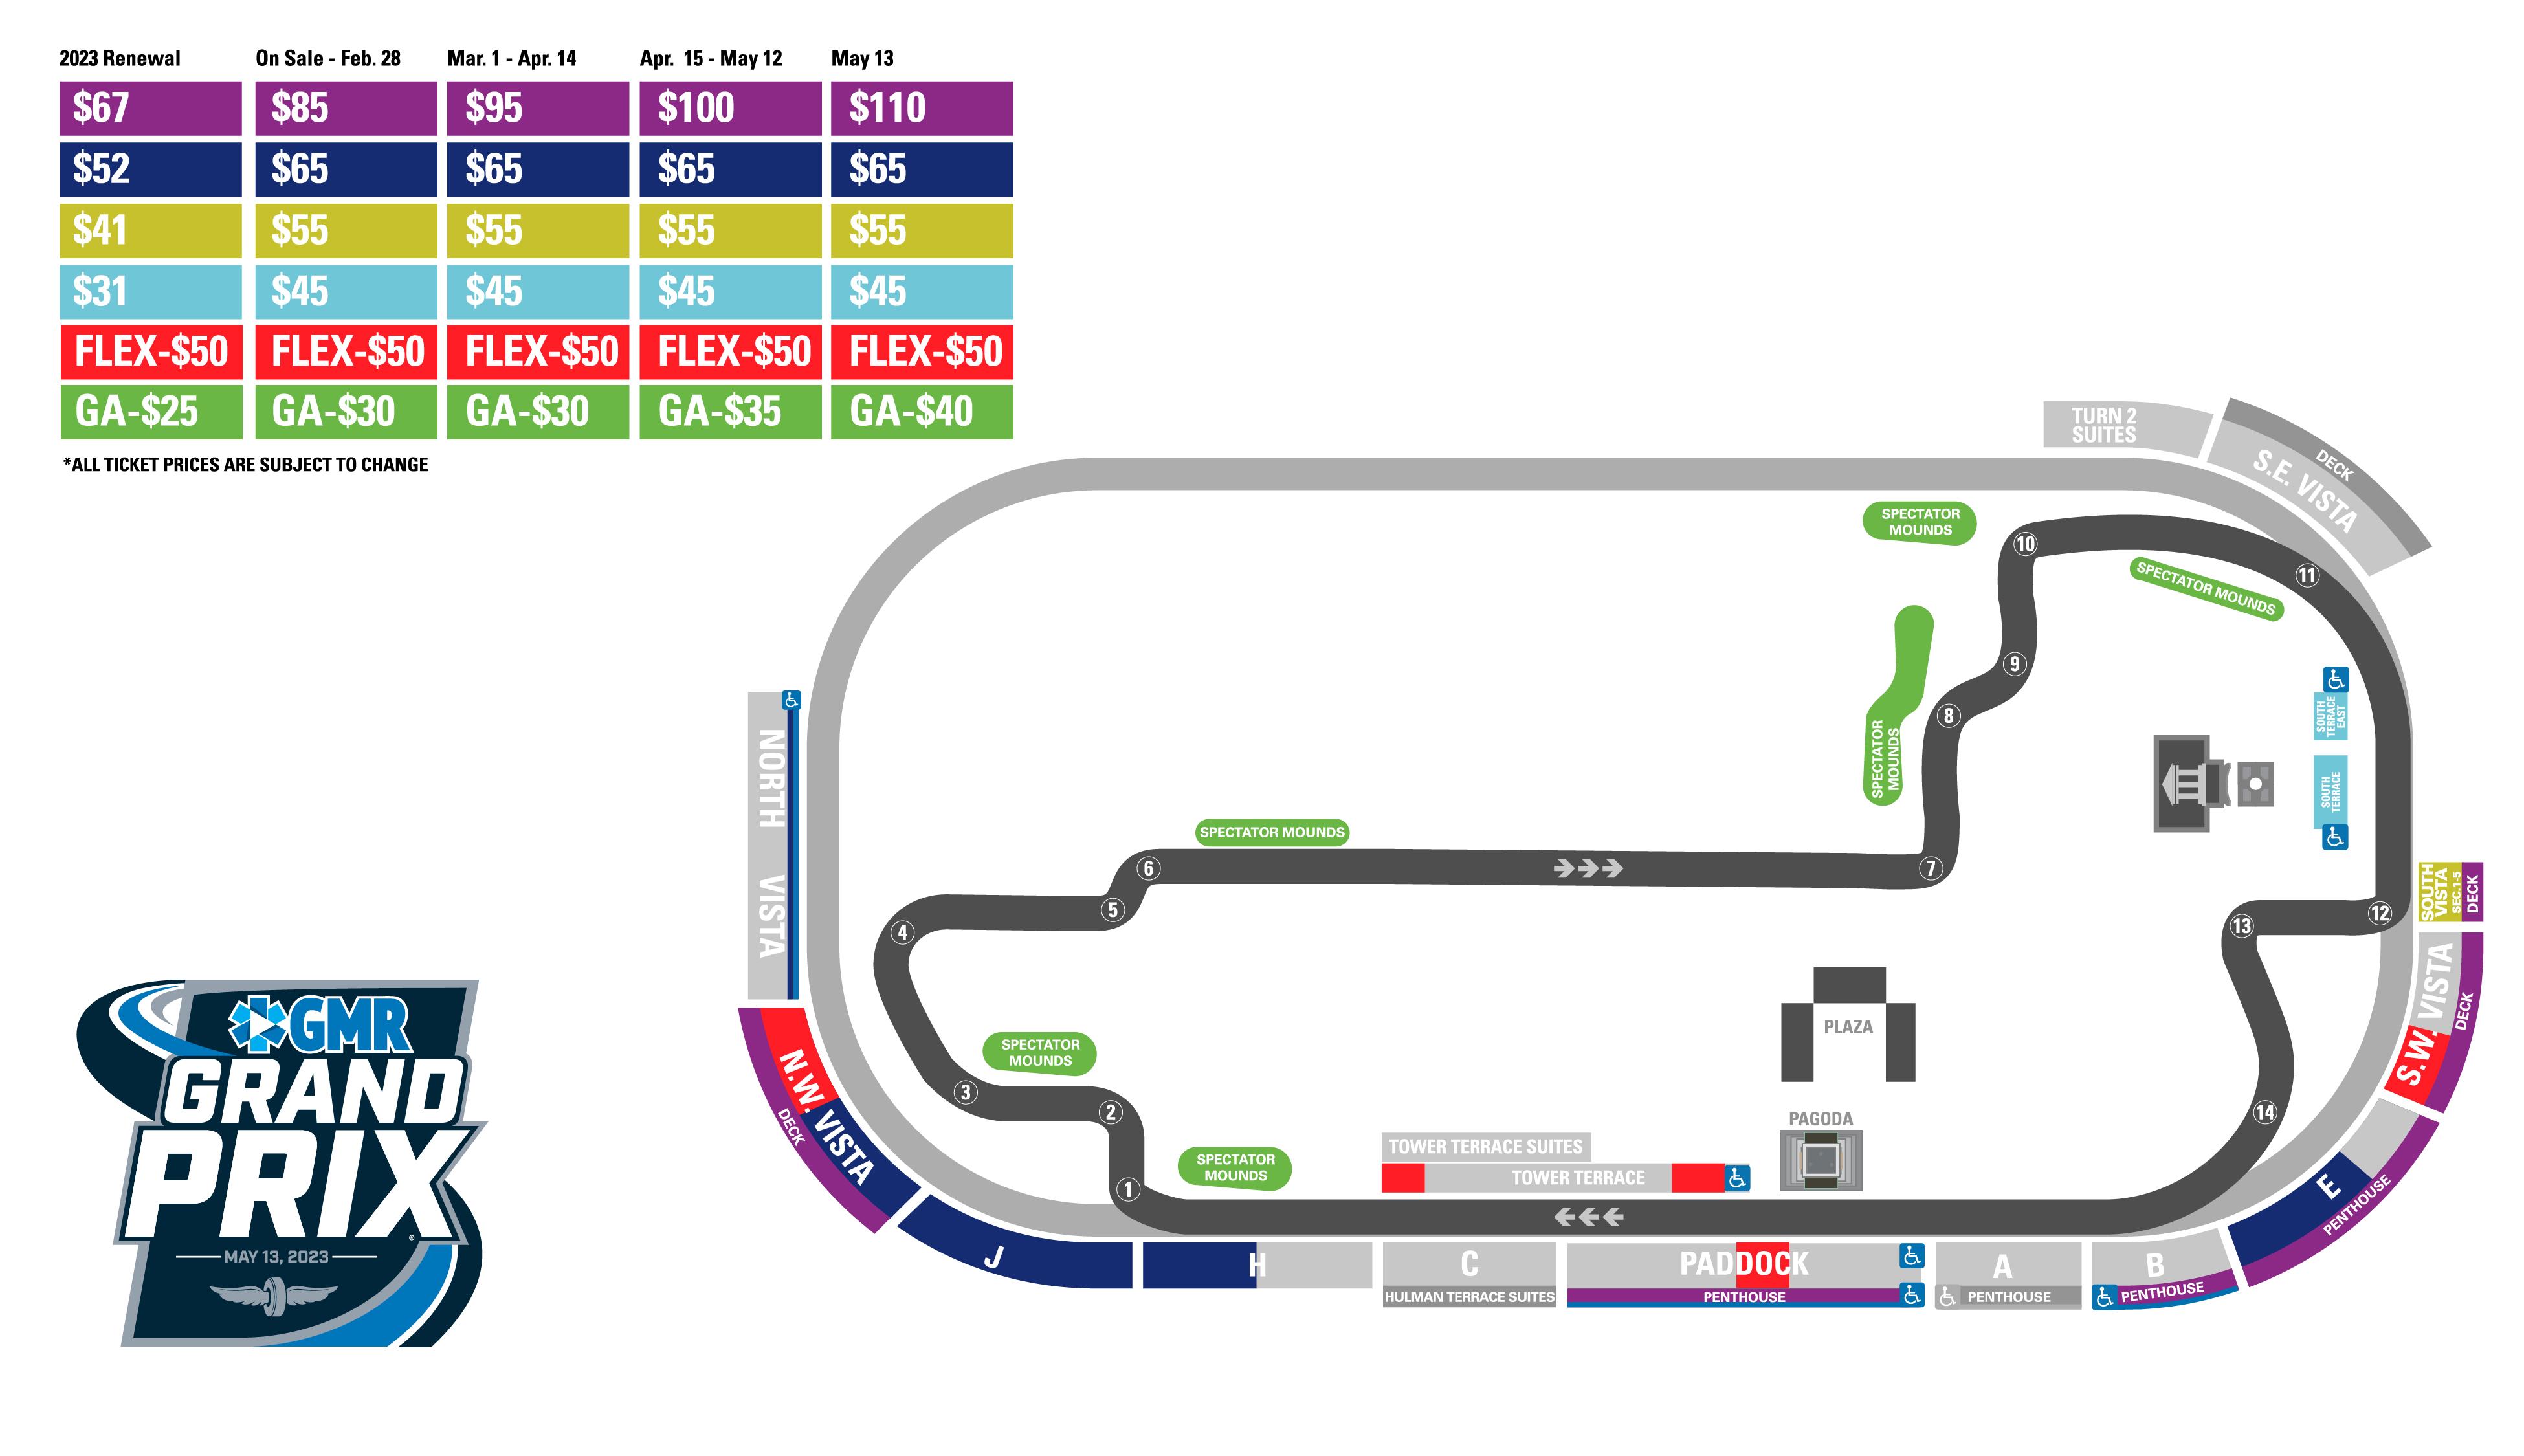 INDYCAR Grand Prix Price Map